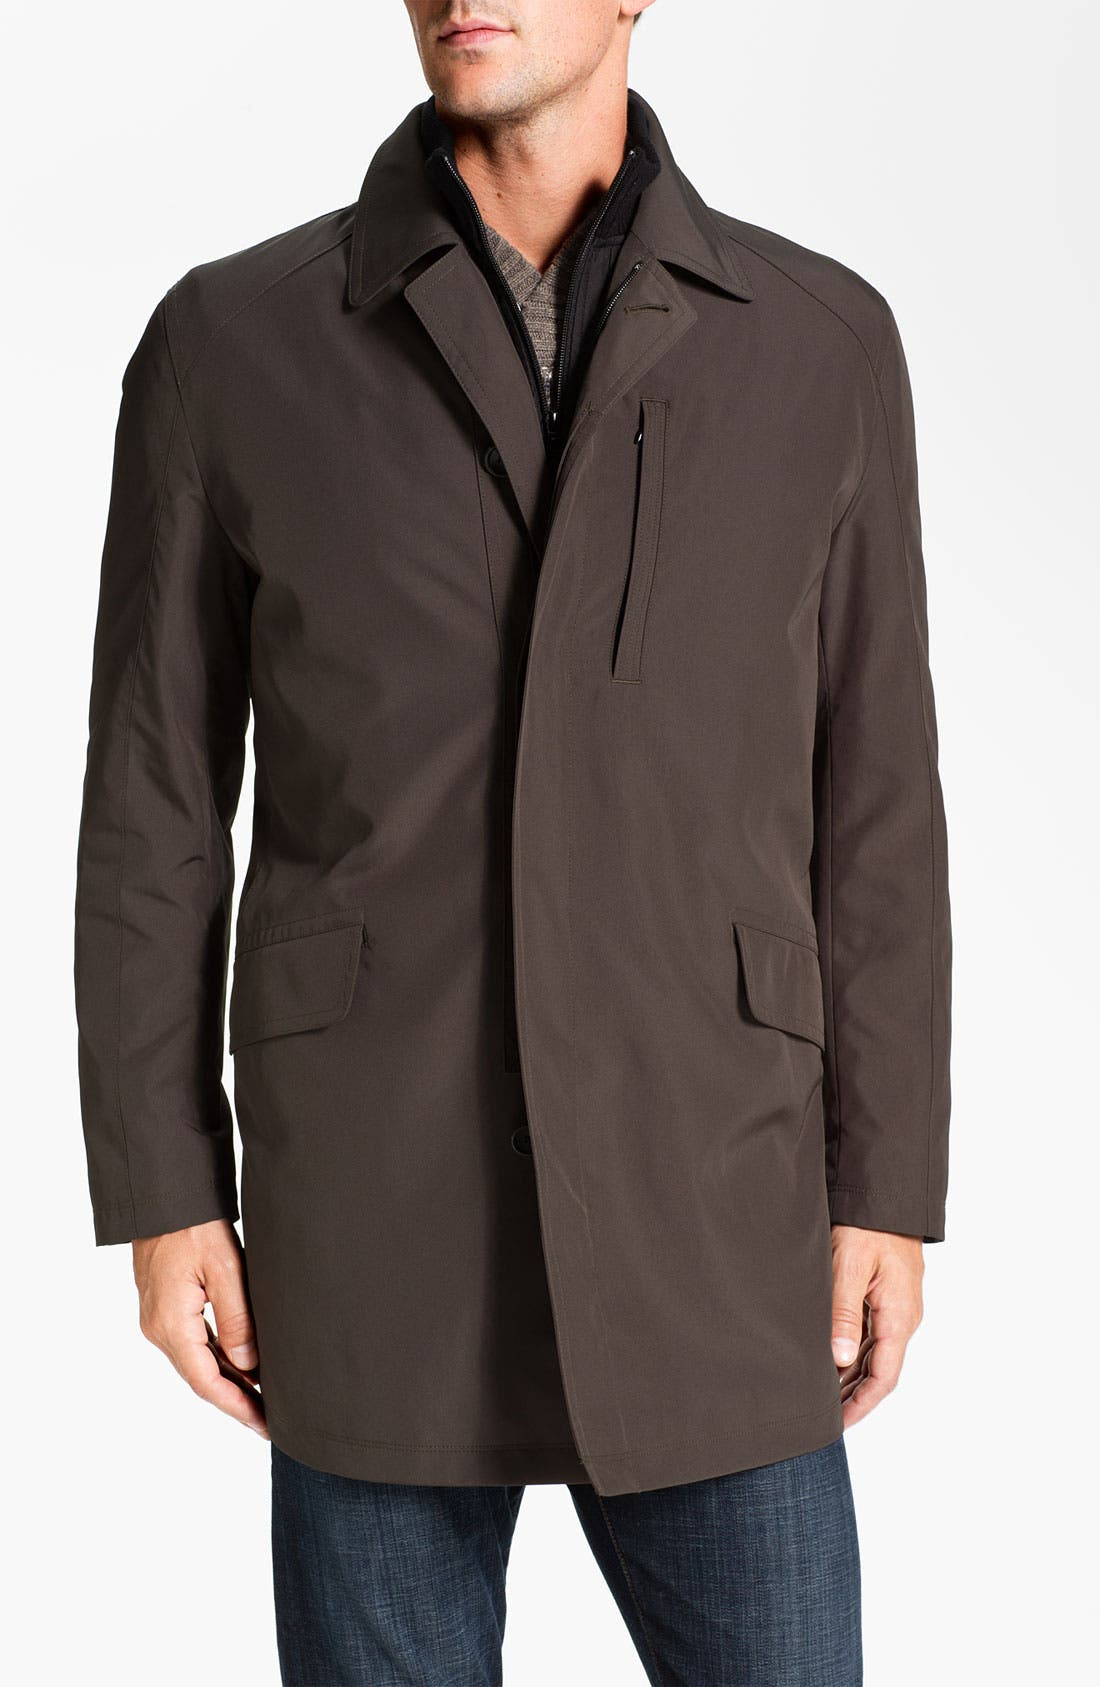 Main Image - Sanyo 3-in-1 Jacket